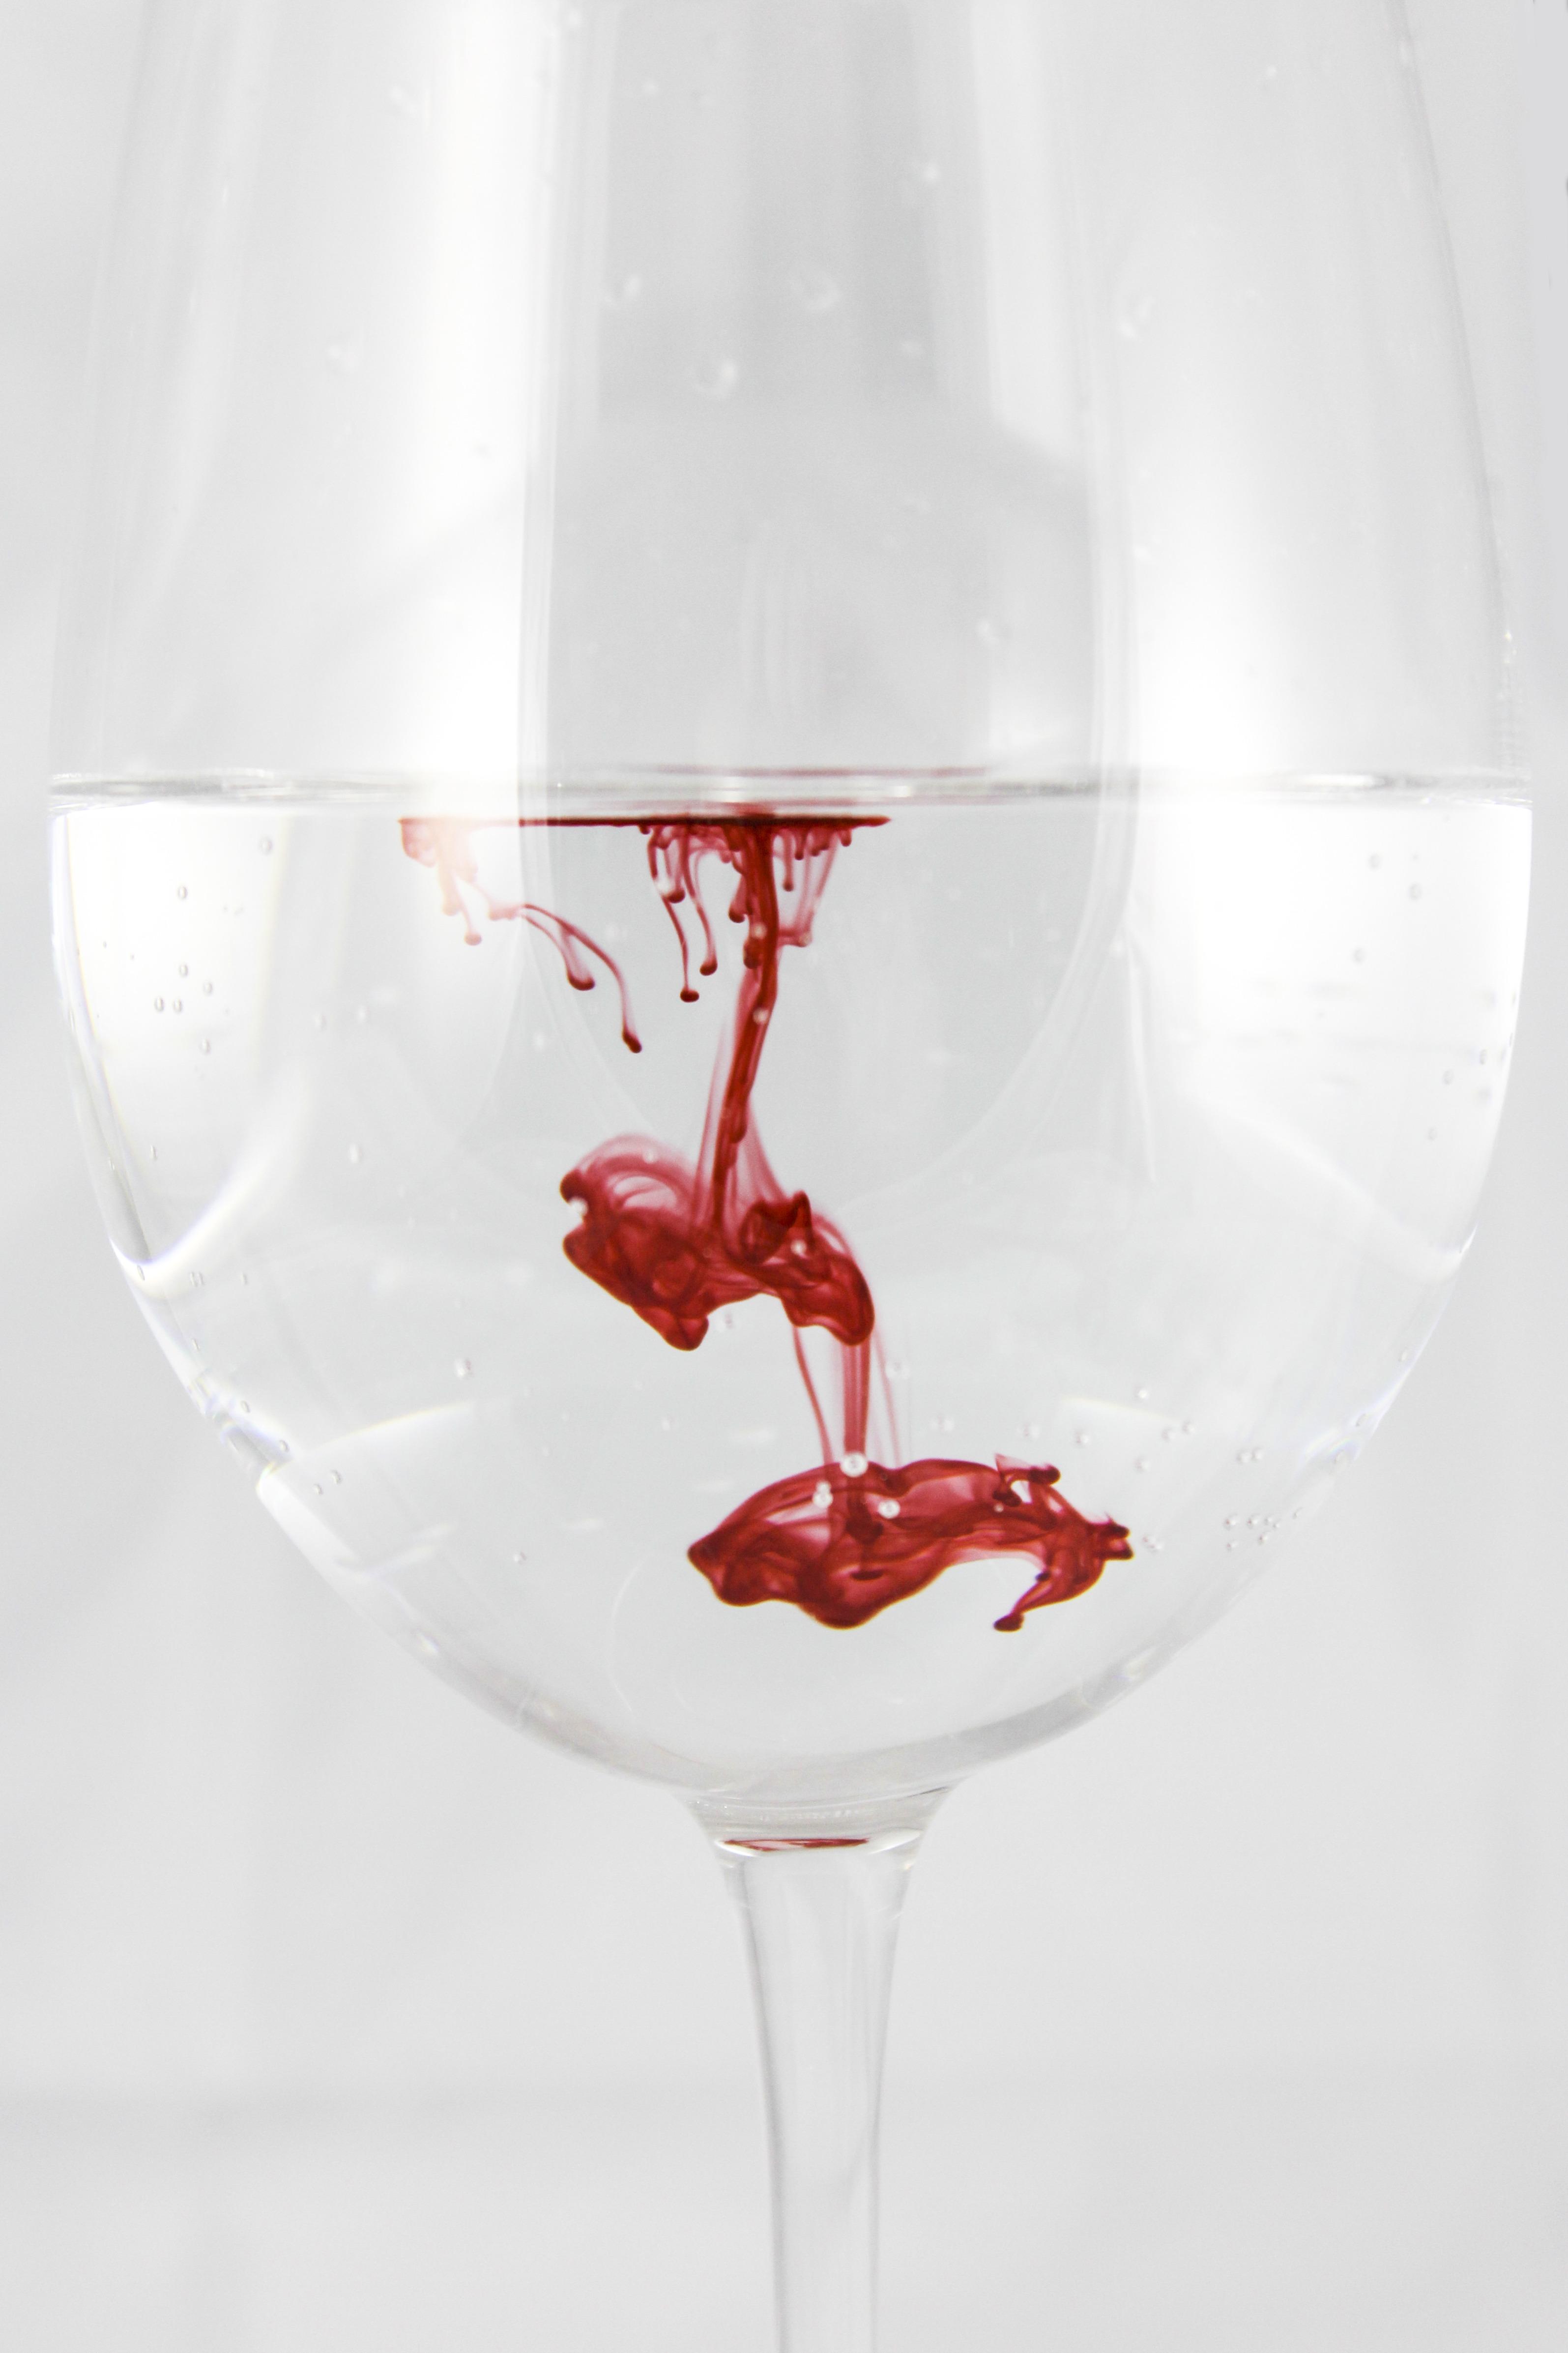 Blood, Water, Wine